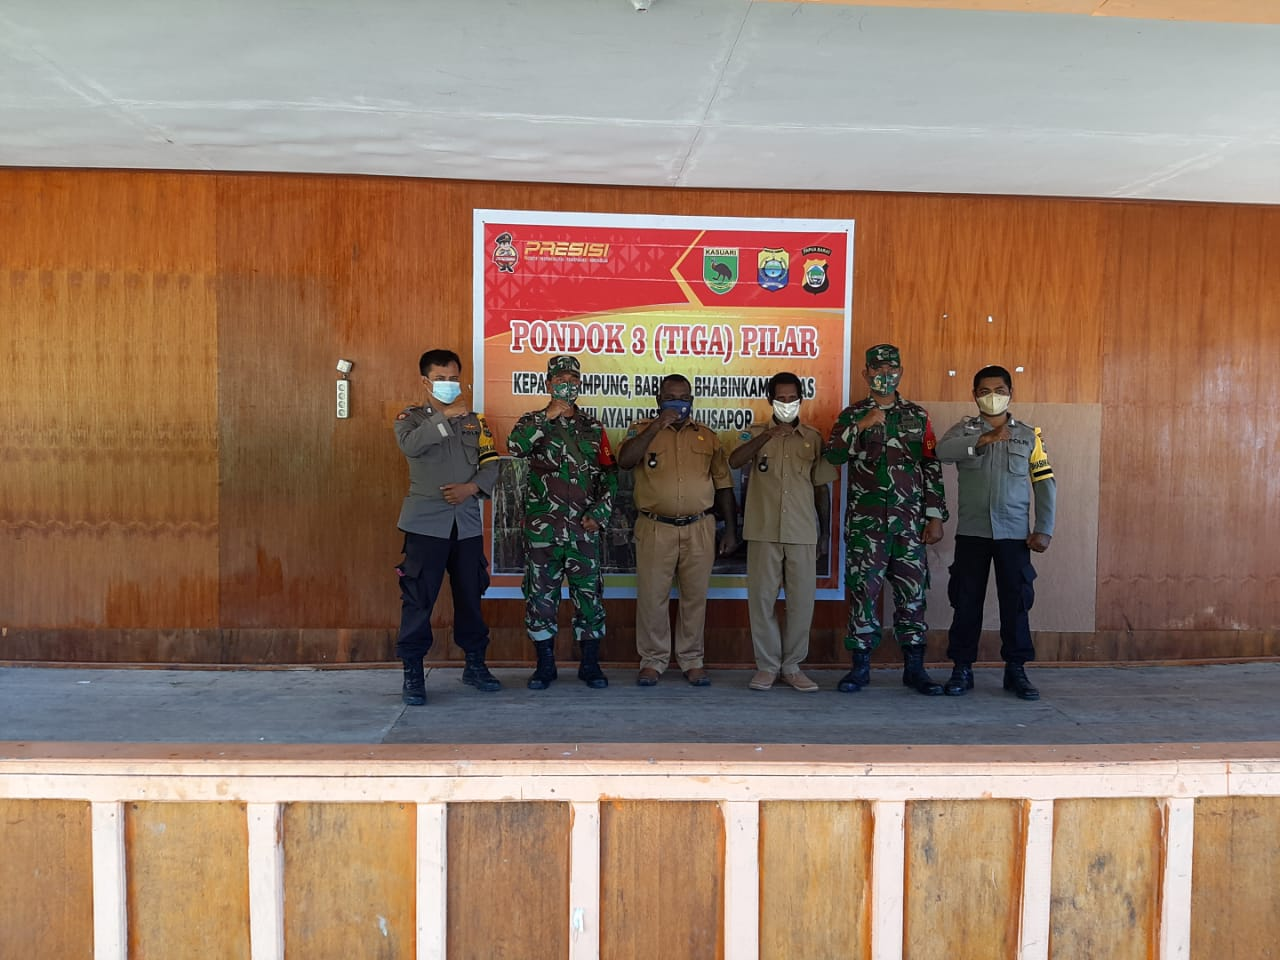 Bhabinkamtibmas Bersama Perangkat Kampung, Pasang Kampung Yabanonti ( Kampung Tangguh) Di kampung Nanggouw Distrik Sausapor